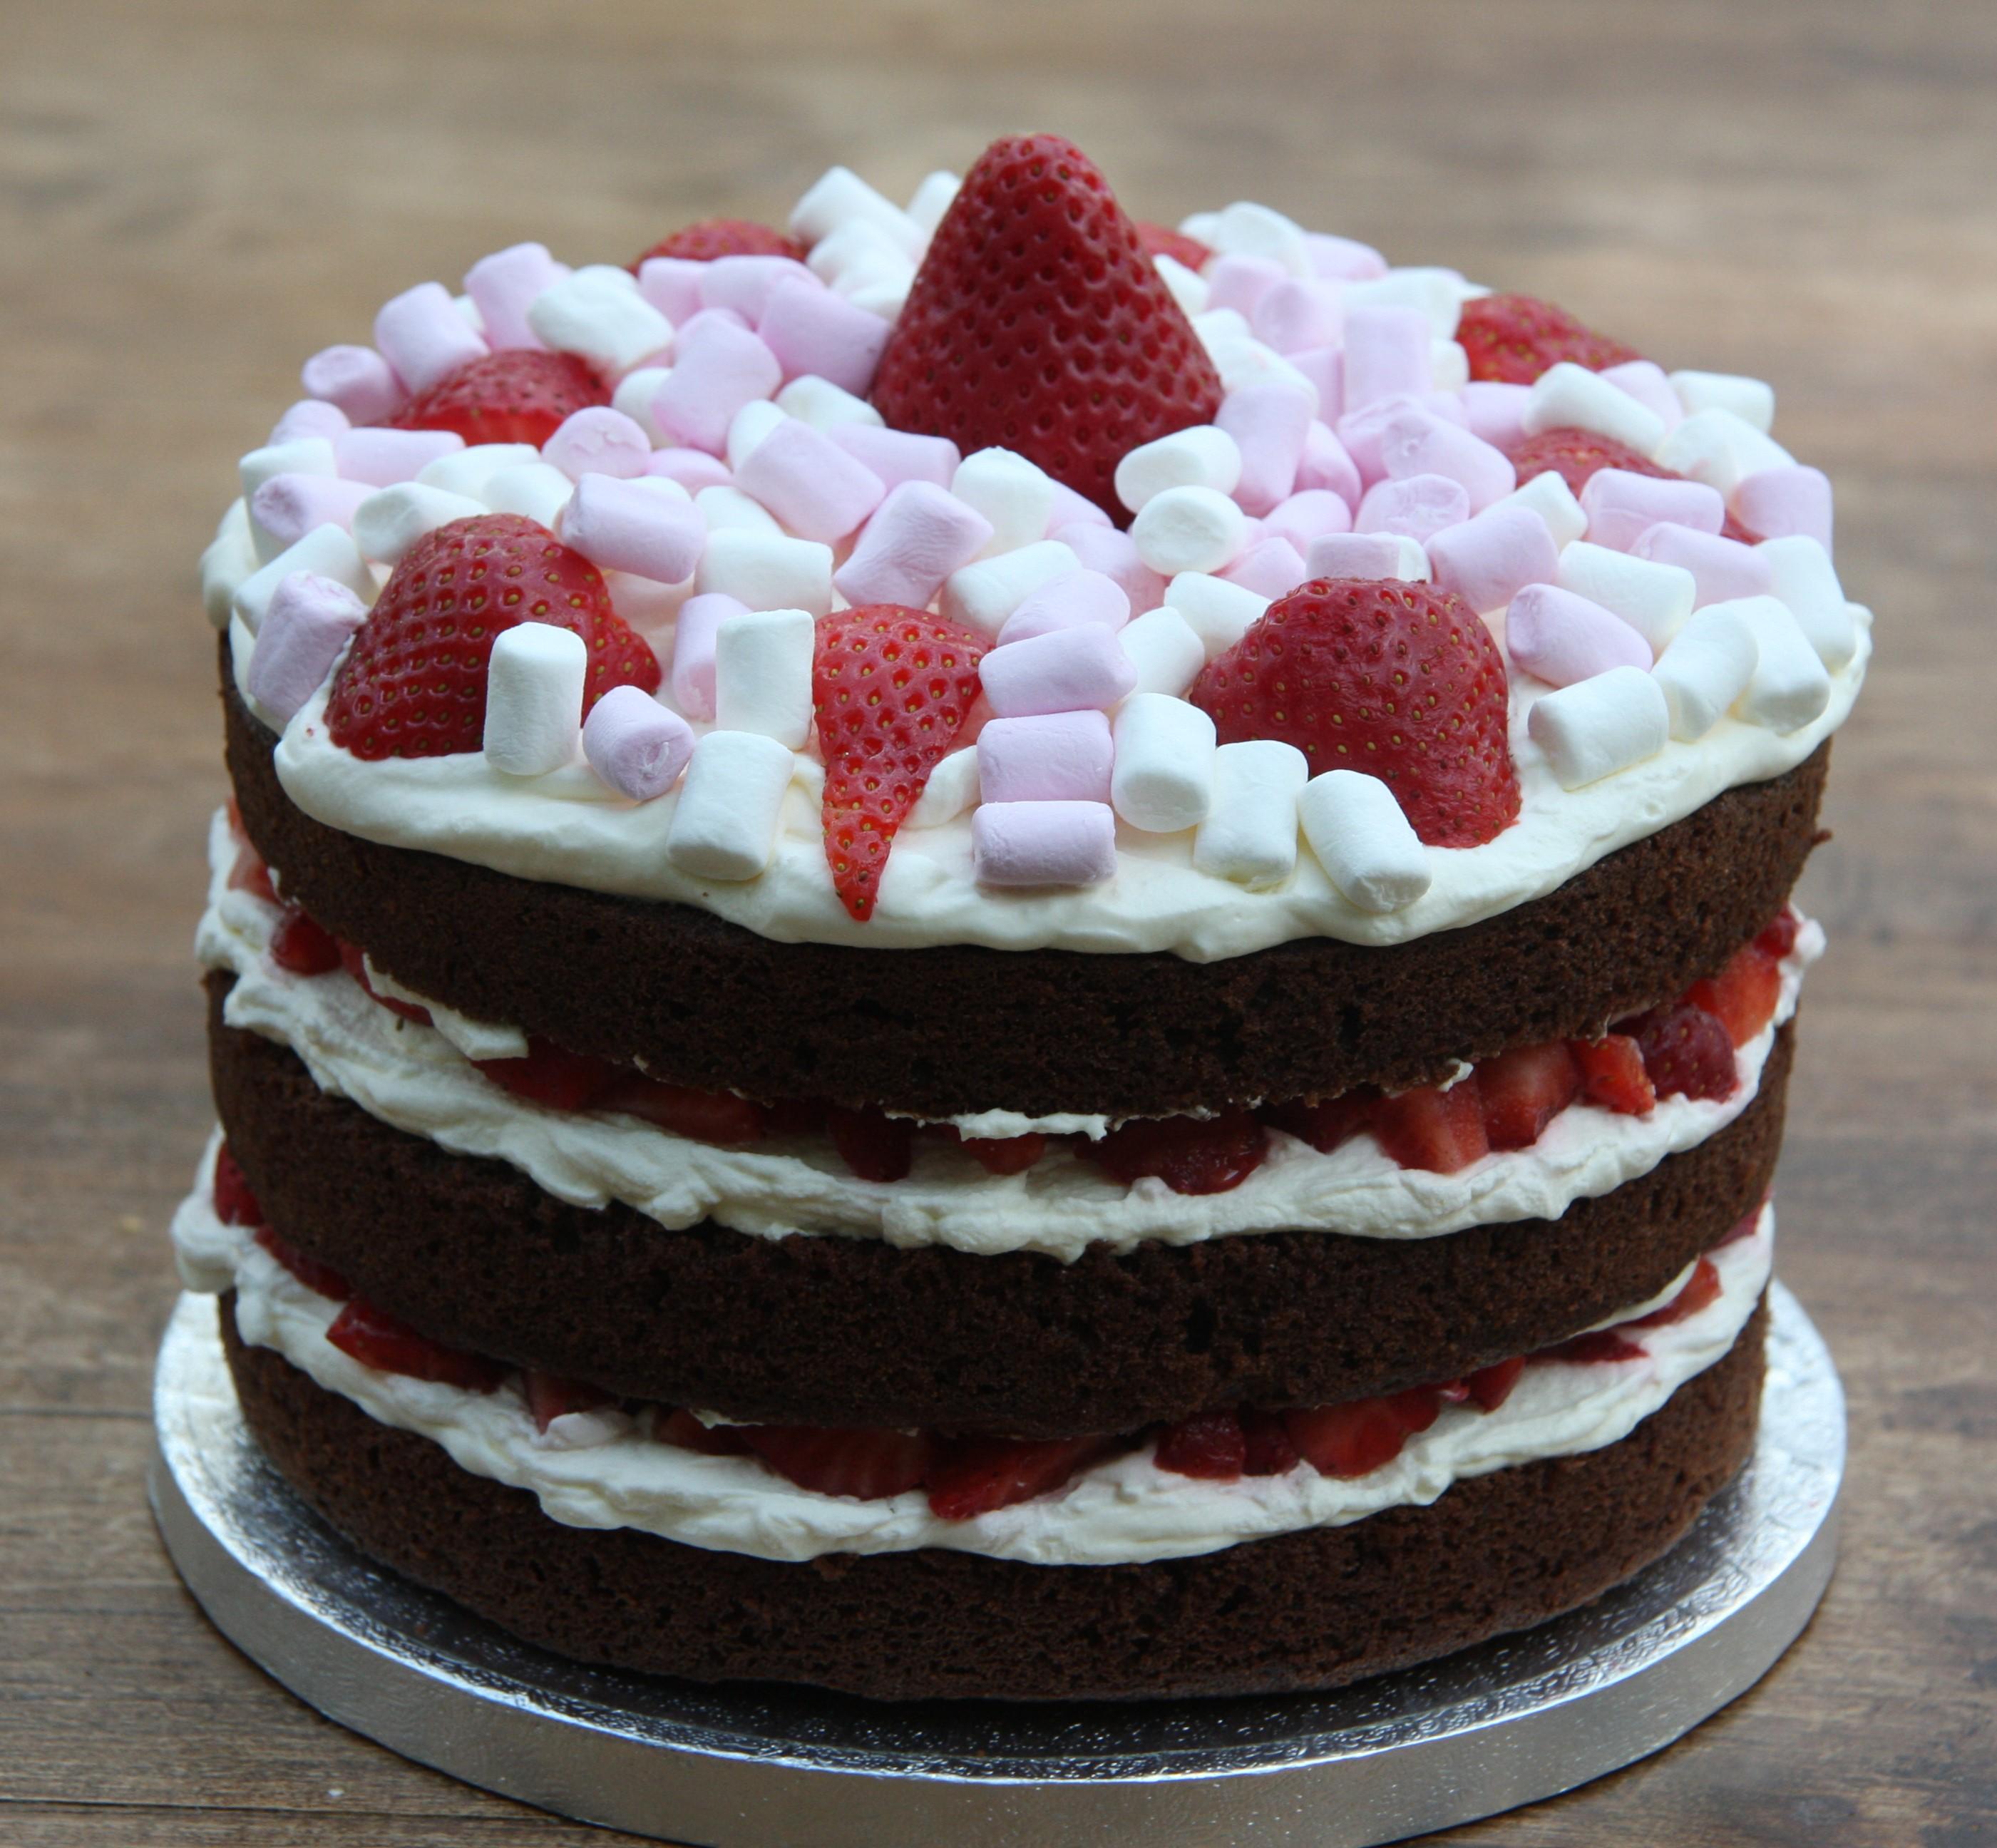 Chocolate Strawberry Cake Images : Chocolate Birthday Cake with Strawberries and Cream, and ...